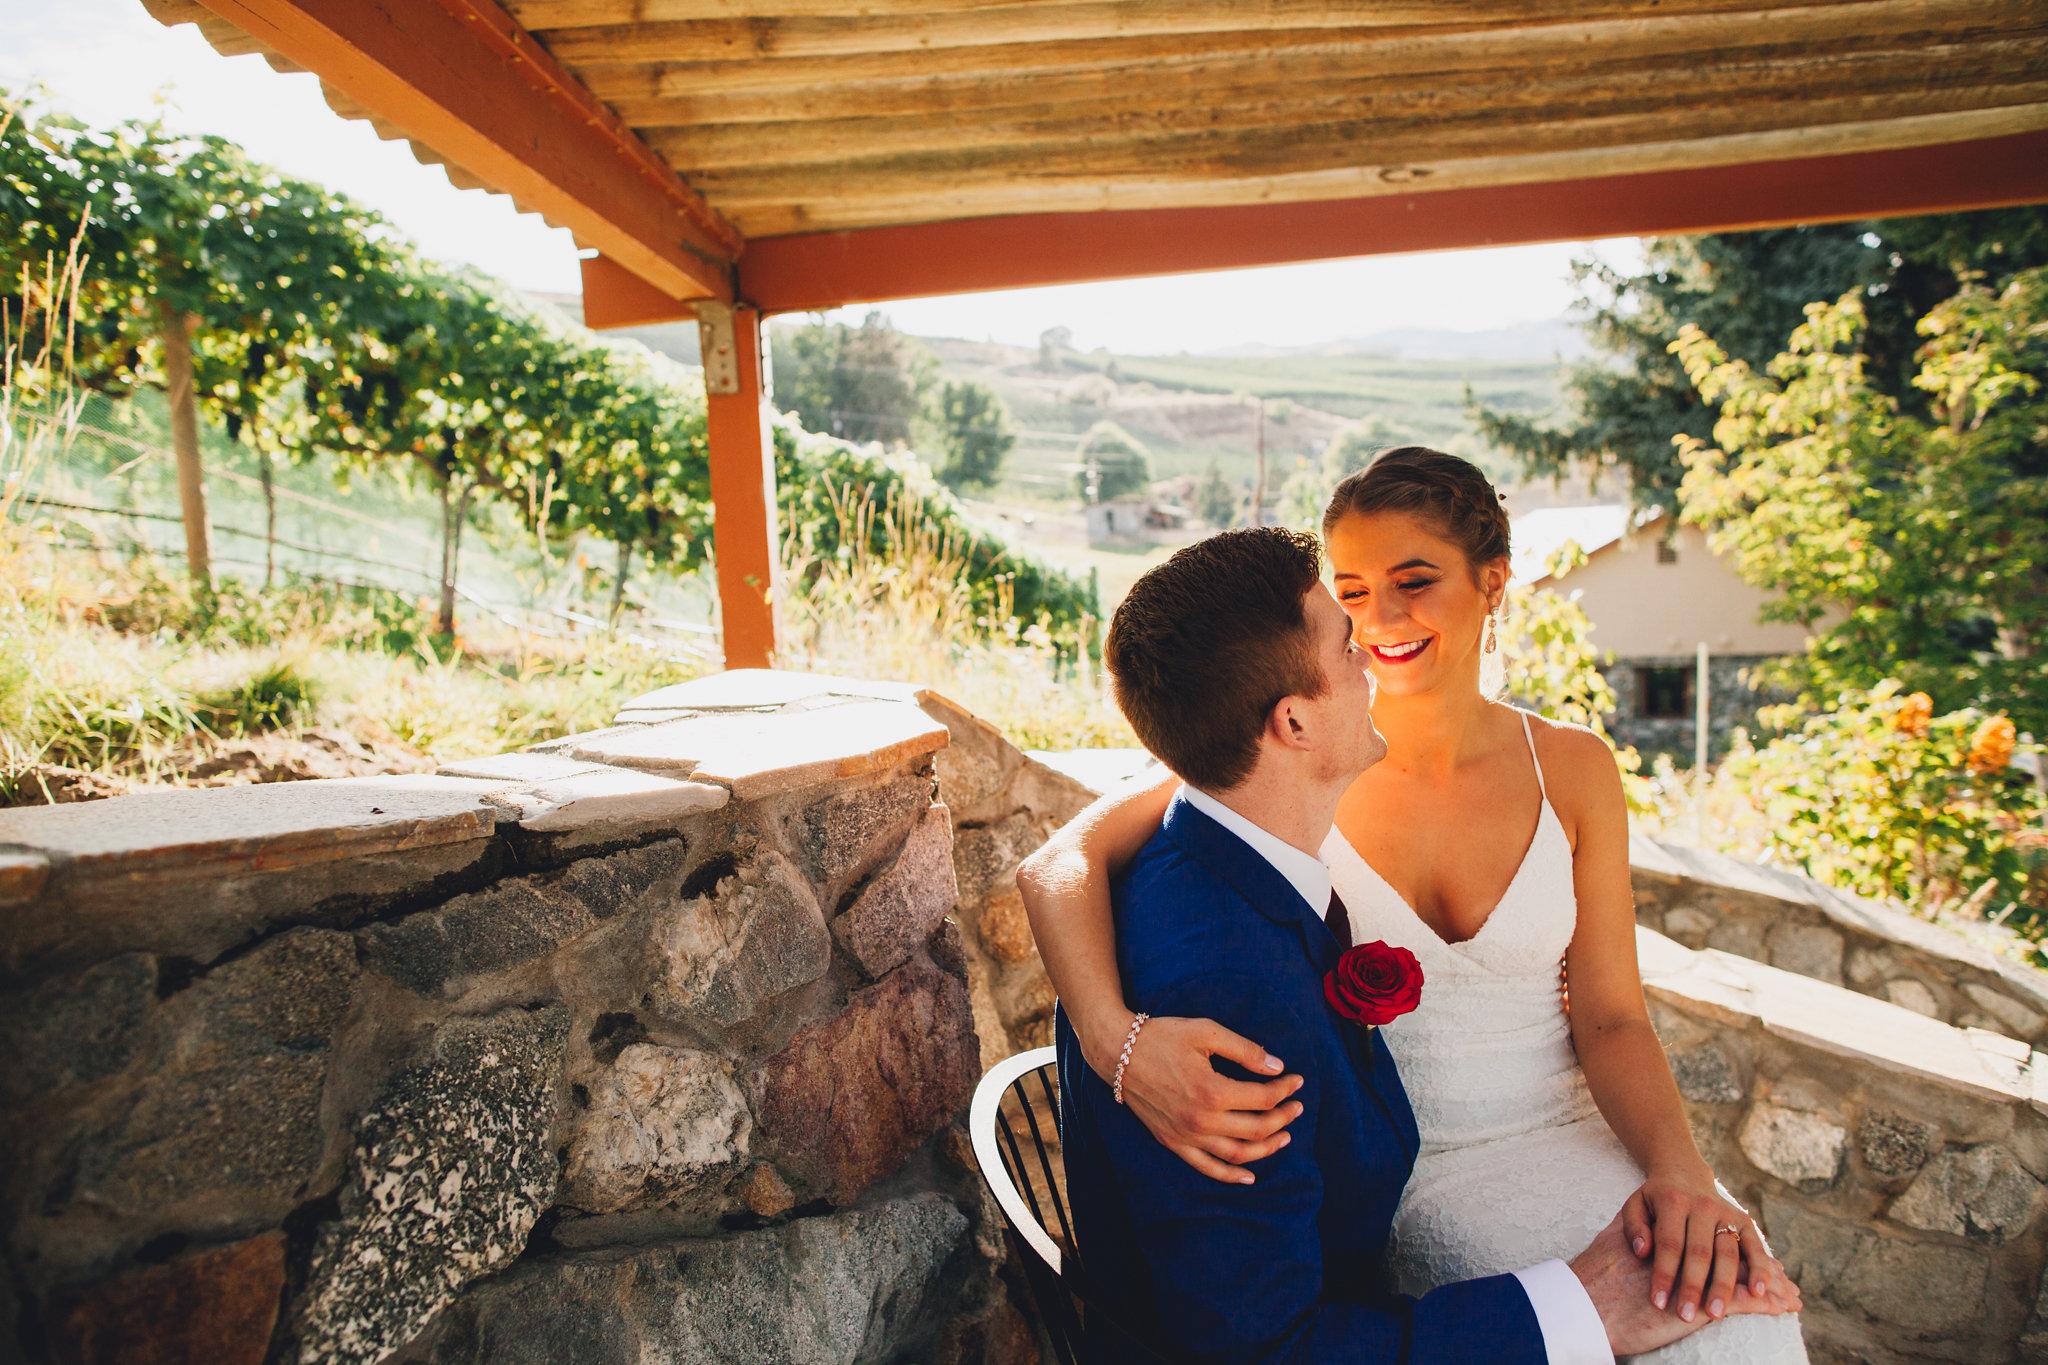 Tunnel Hill Winery Lake Chelan Washington Wedding | Lake Chelan Wedding Venues | Summer Vineyard Wedding Reception | Pacific Northwest Wineries | Tida Svy Photo | www.tidasvy.com